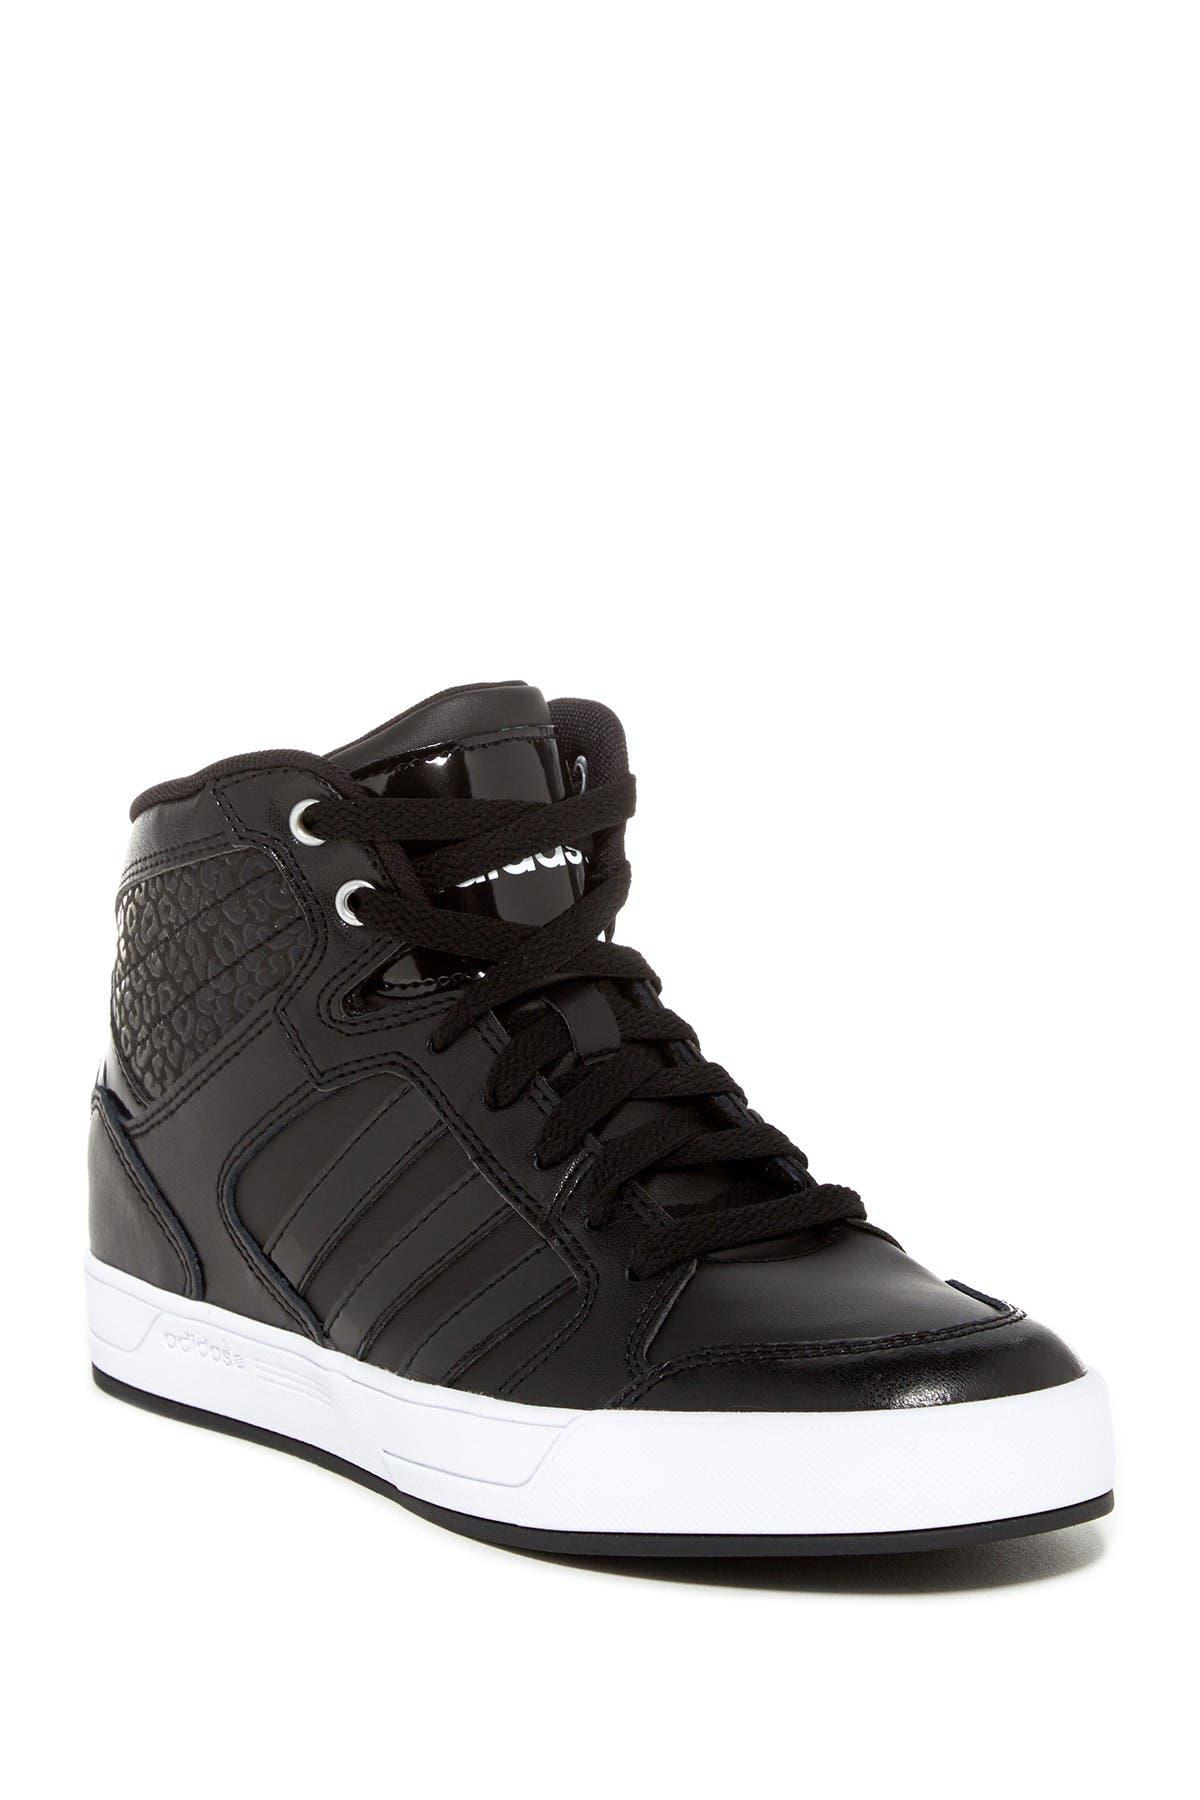 adidas | BBNeo Raleigh Hi-Top Sneaker